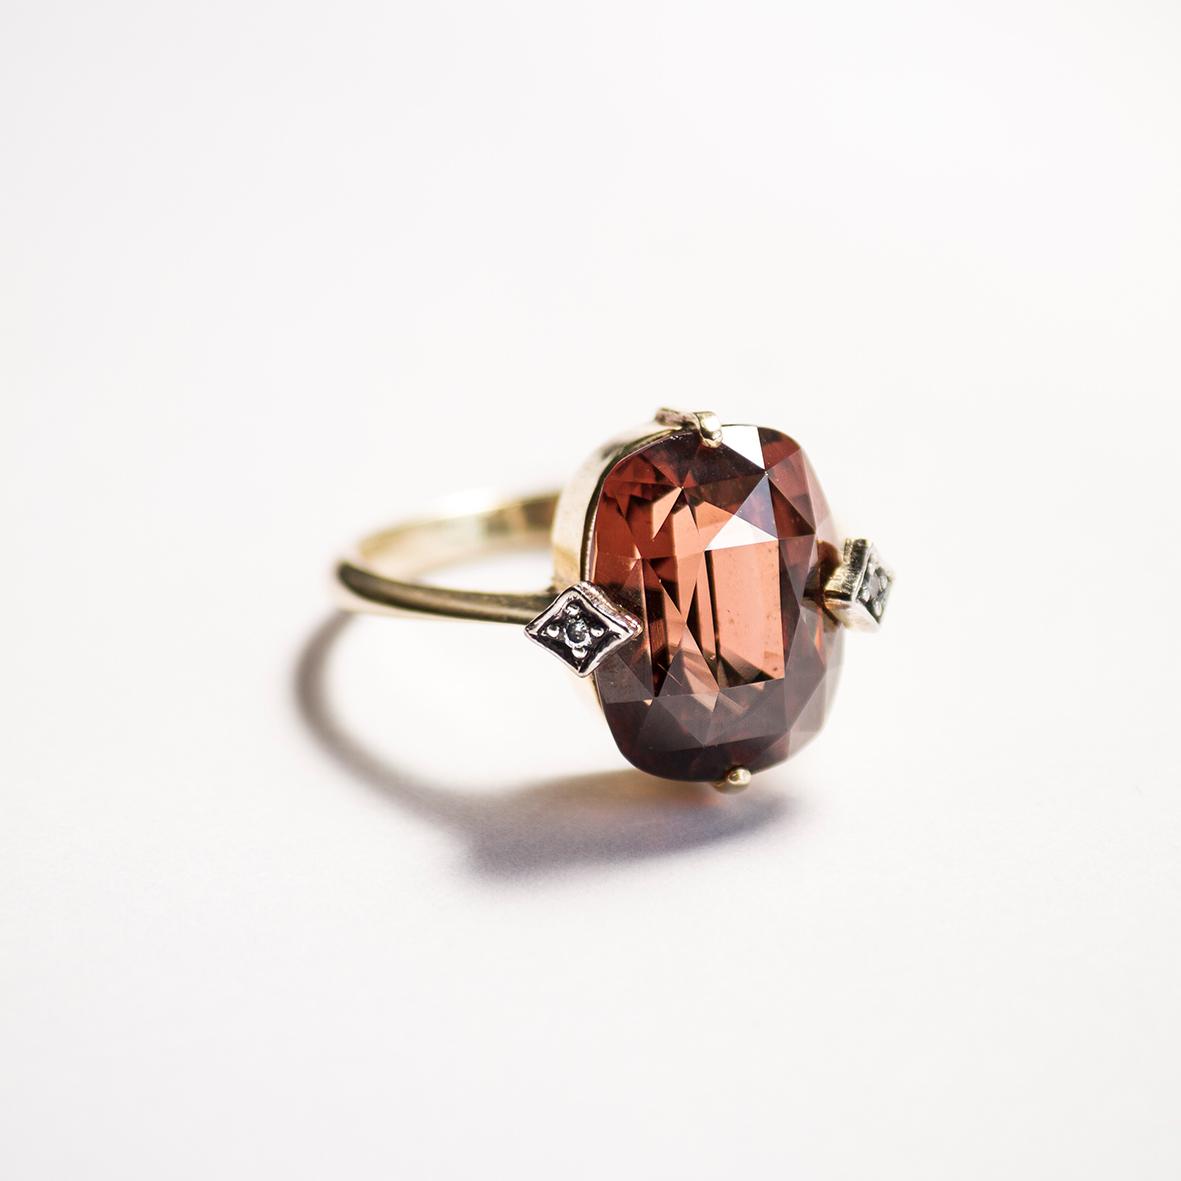 3. OONA_gems of ceylon_principal_red-brown zircon ring